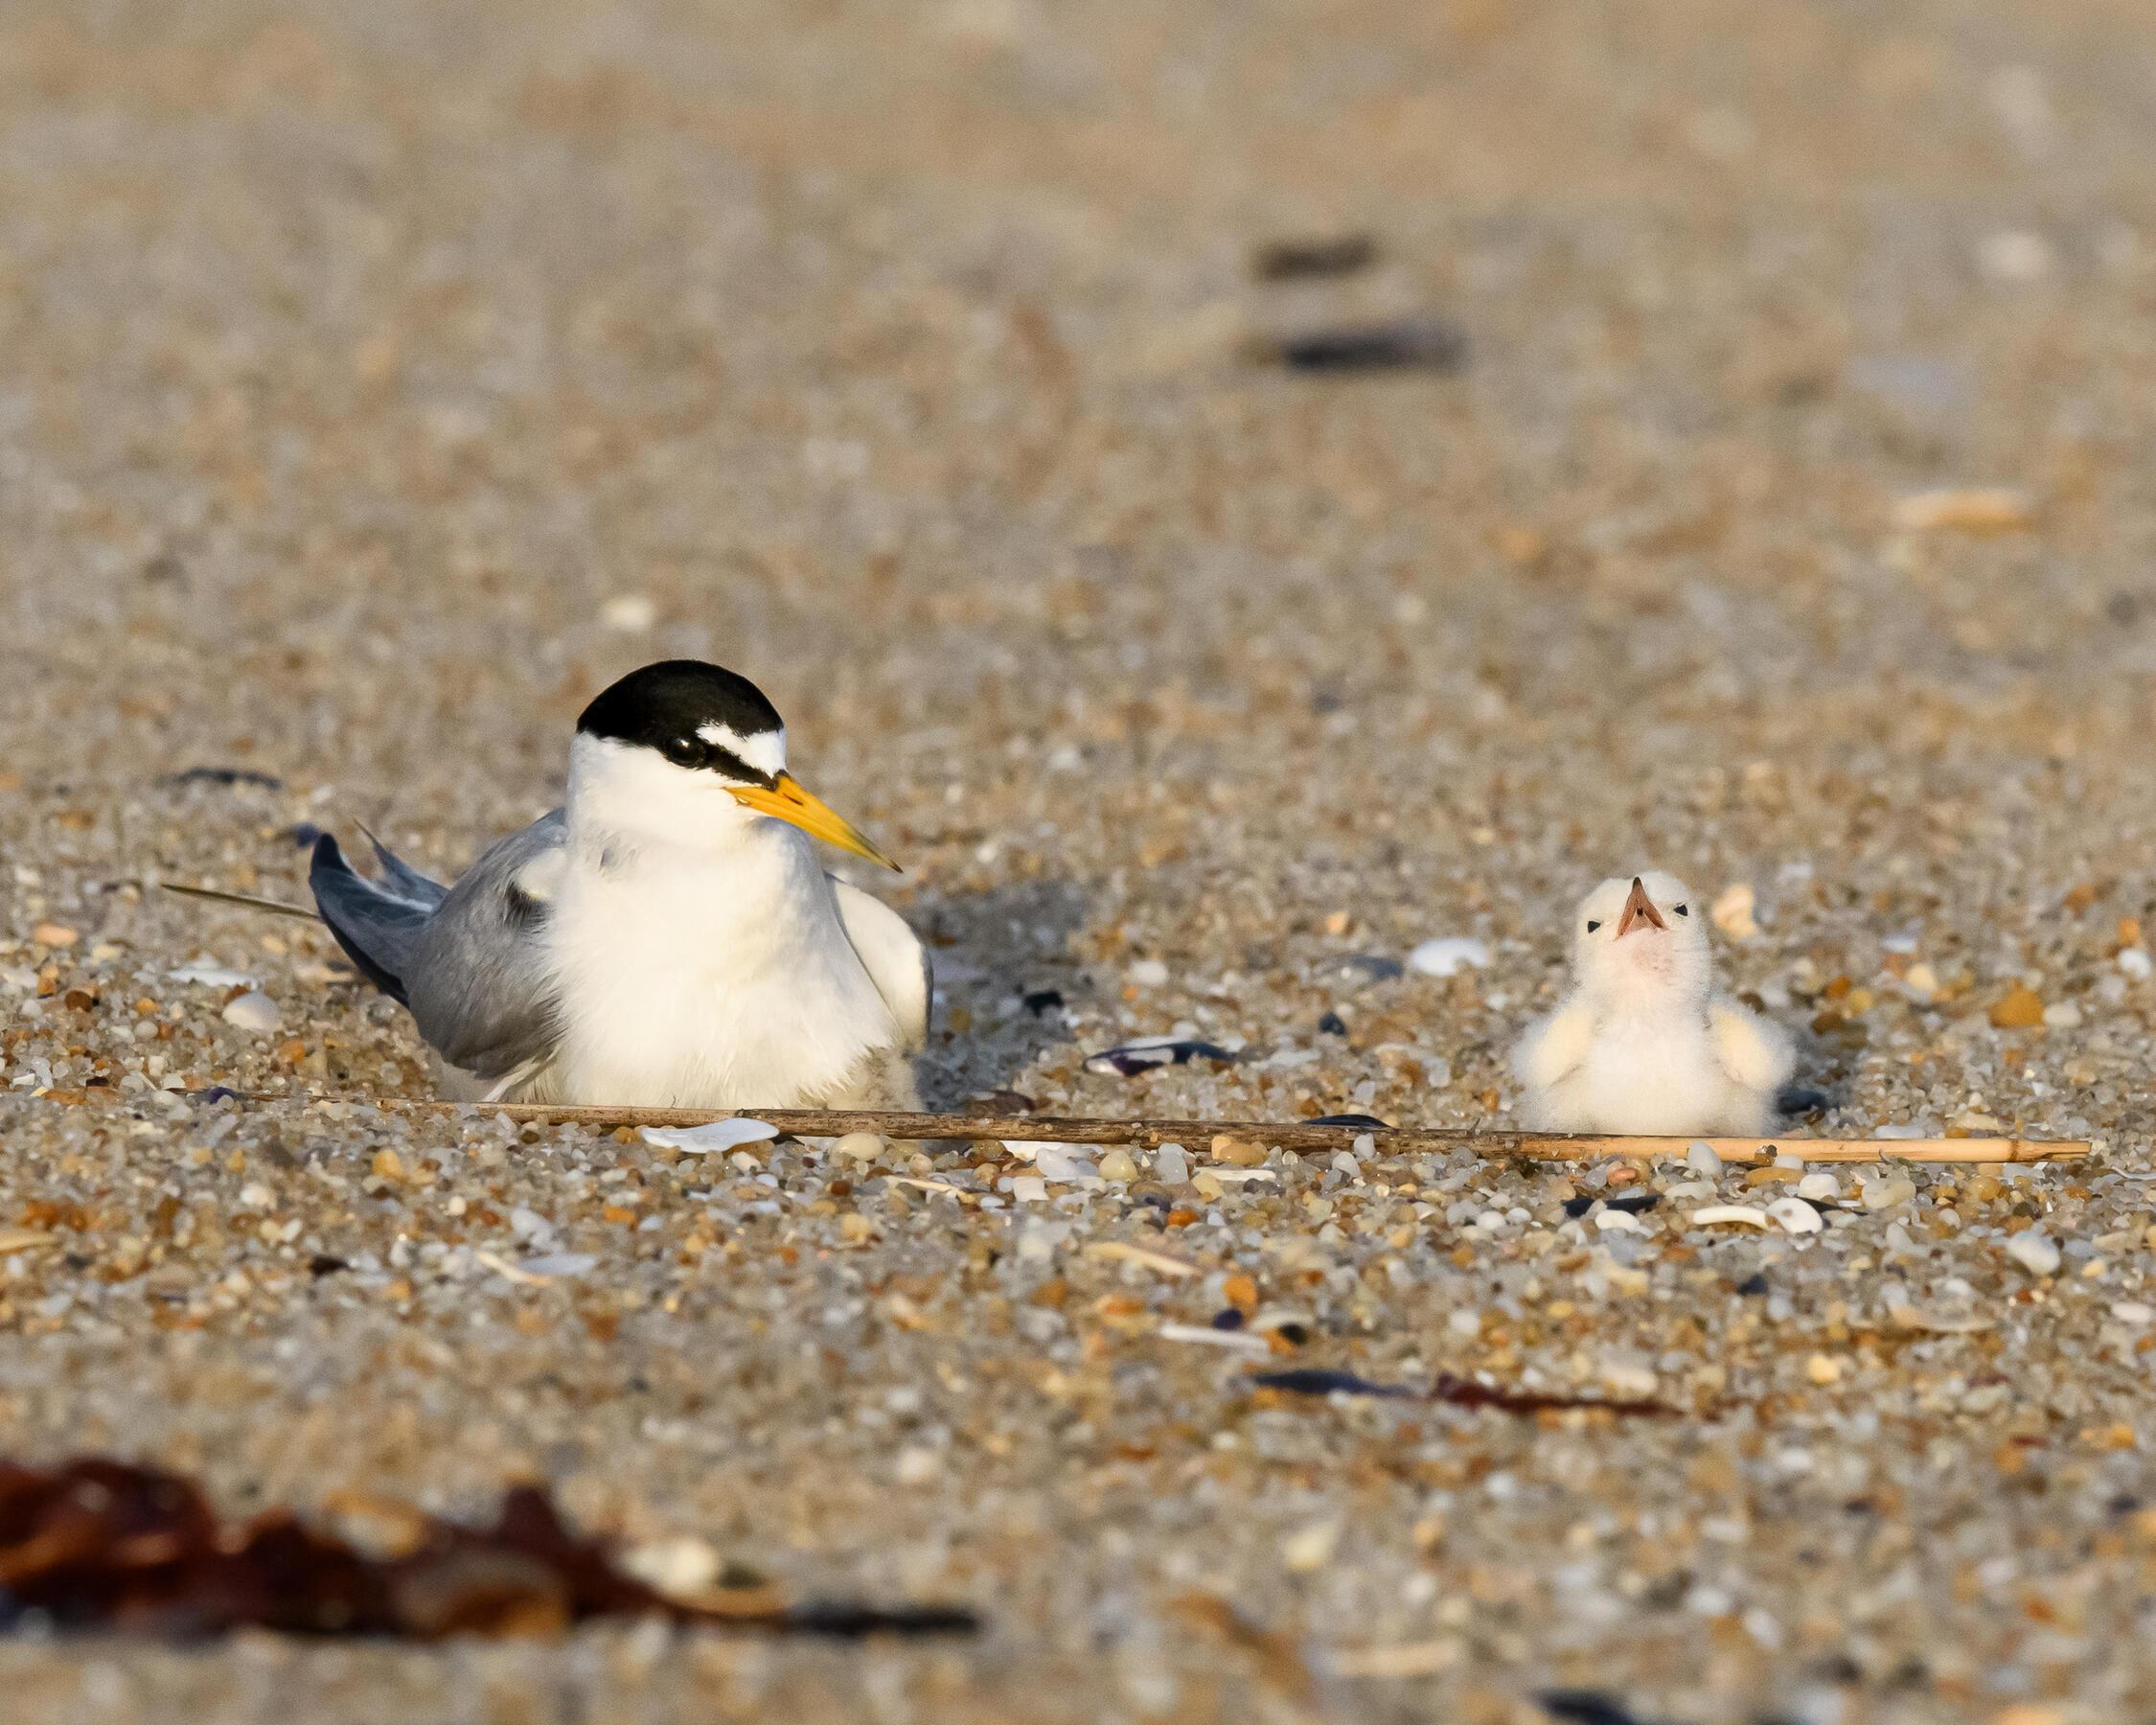 Least Tern and chick. Photo: Robert Cook/Audubon Photography Awards.